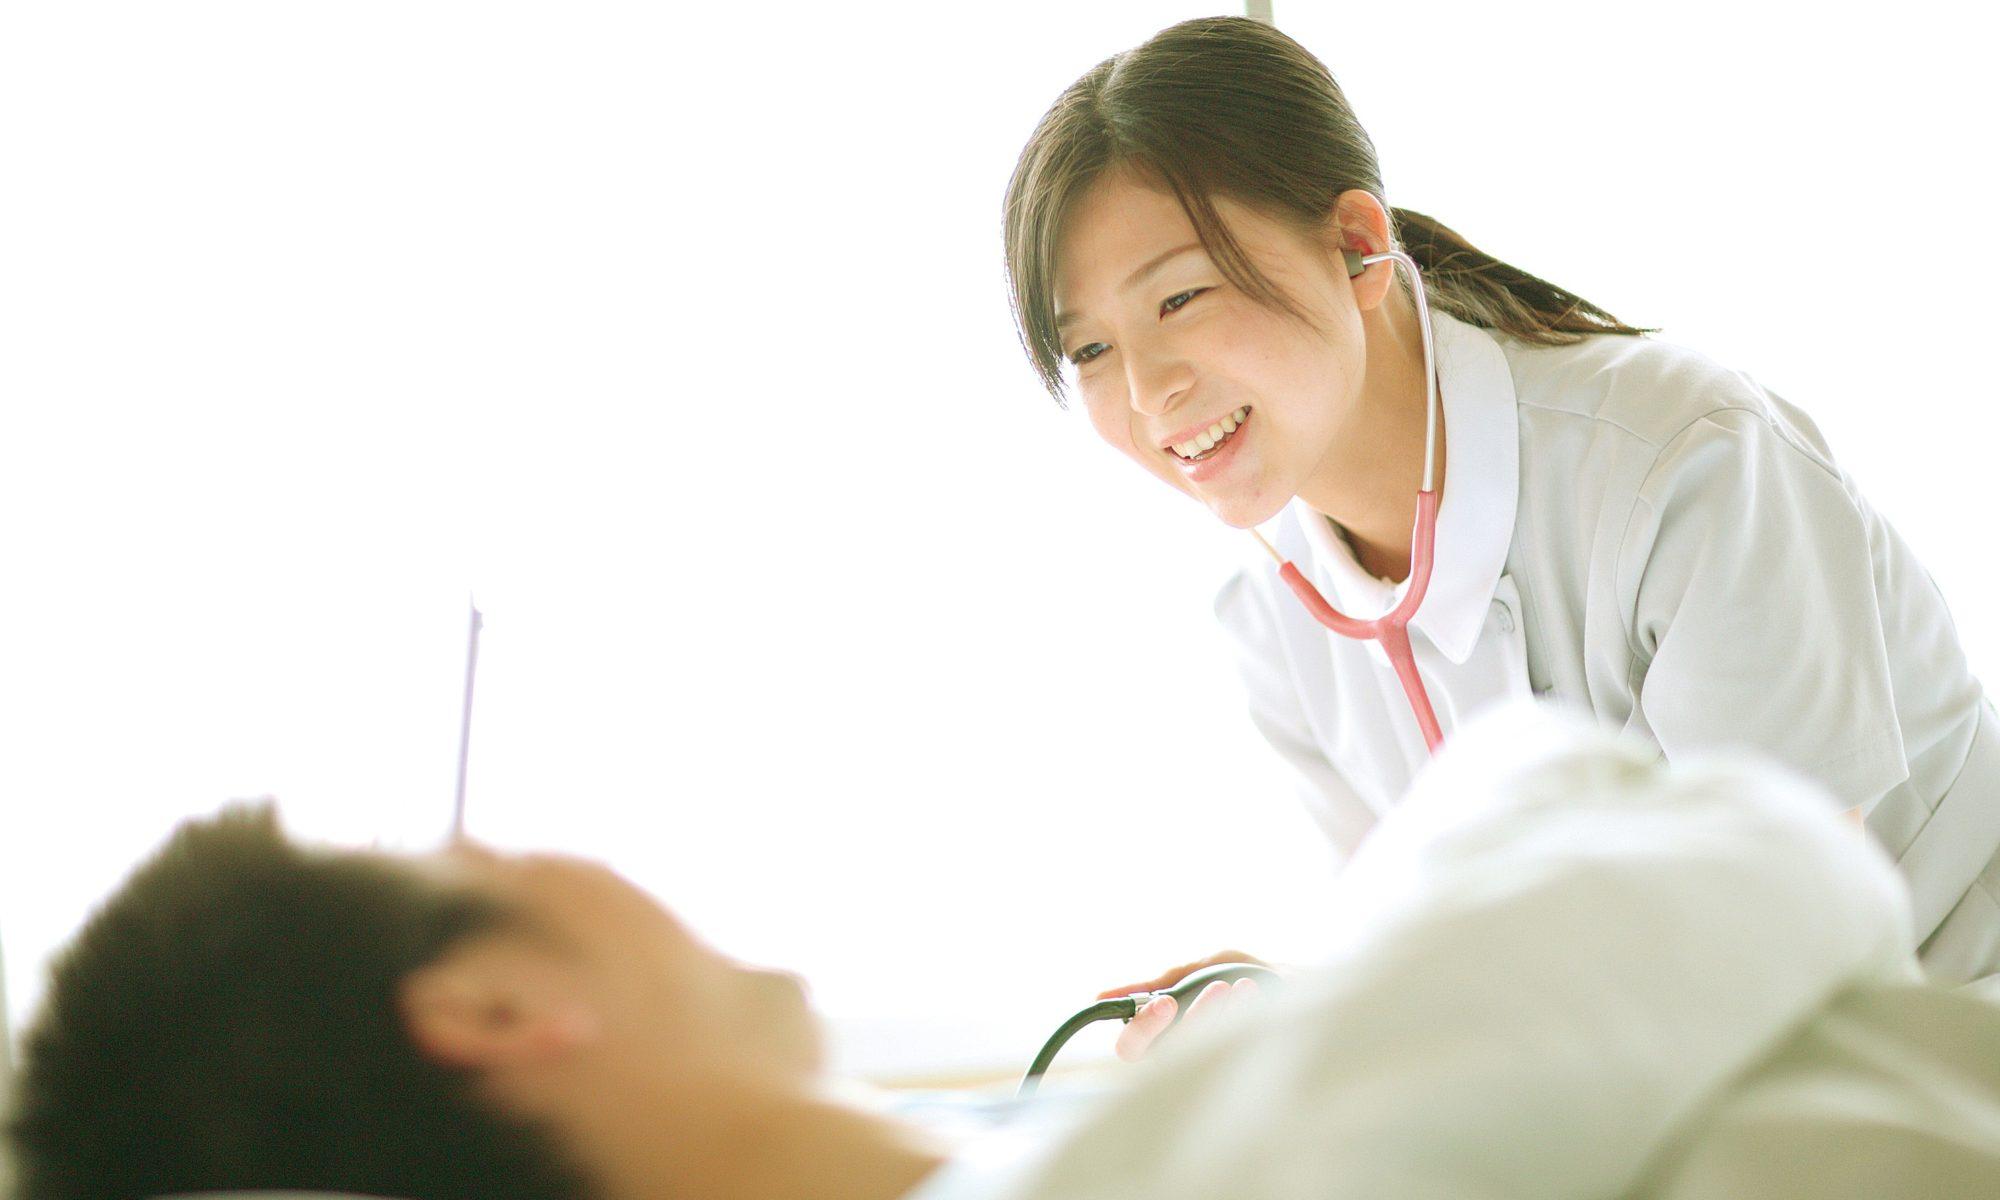 Dr.サポーターズ 高収入モニター アルバイト 日給2万円から半月で30万円